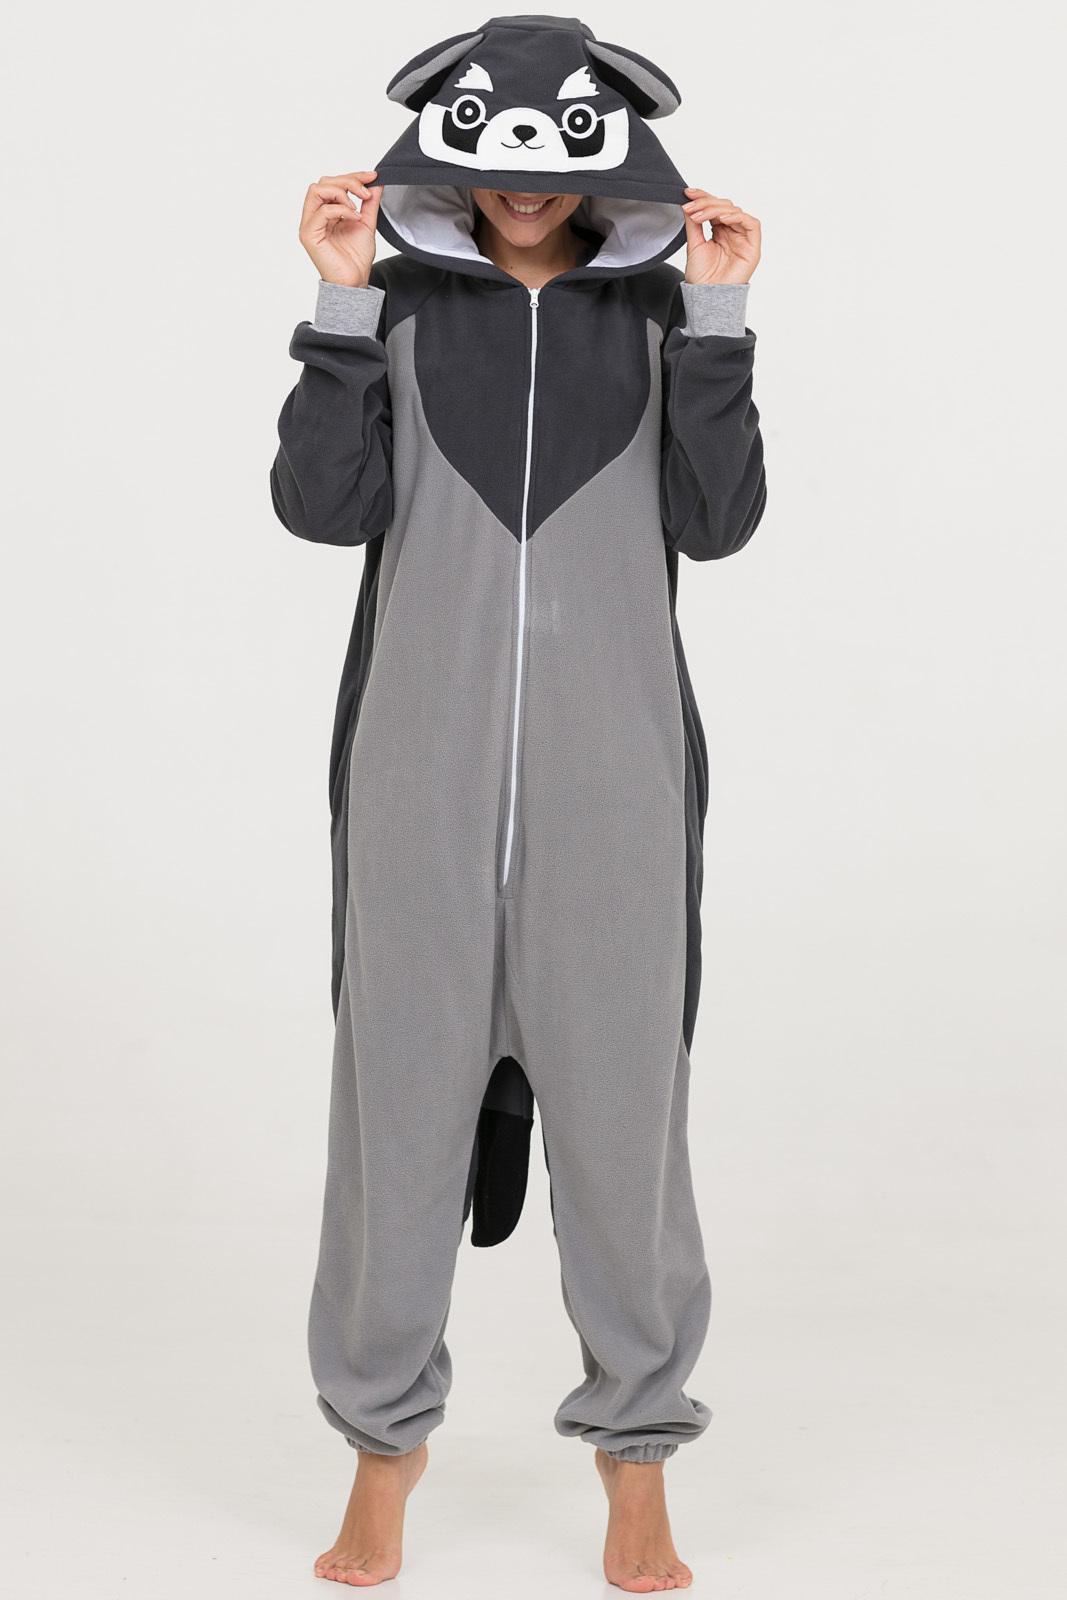 Детская пижама-кигуруми Енот Цвет: Серый (10-12 лет) фото